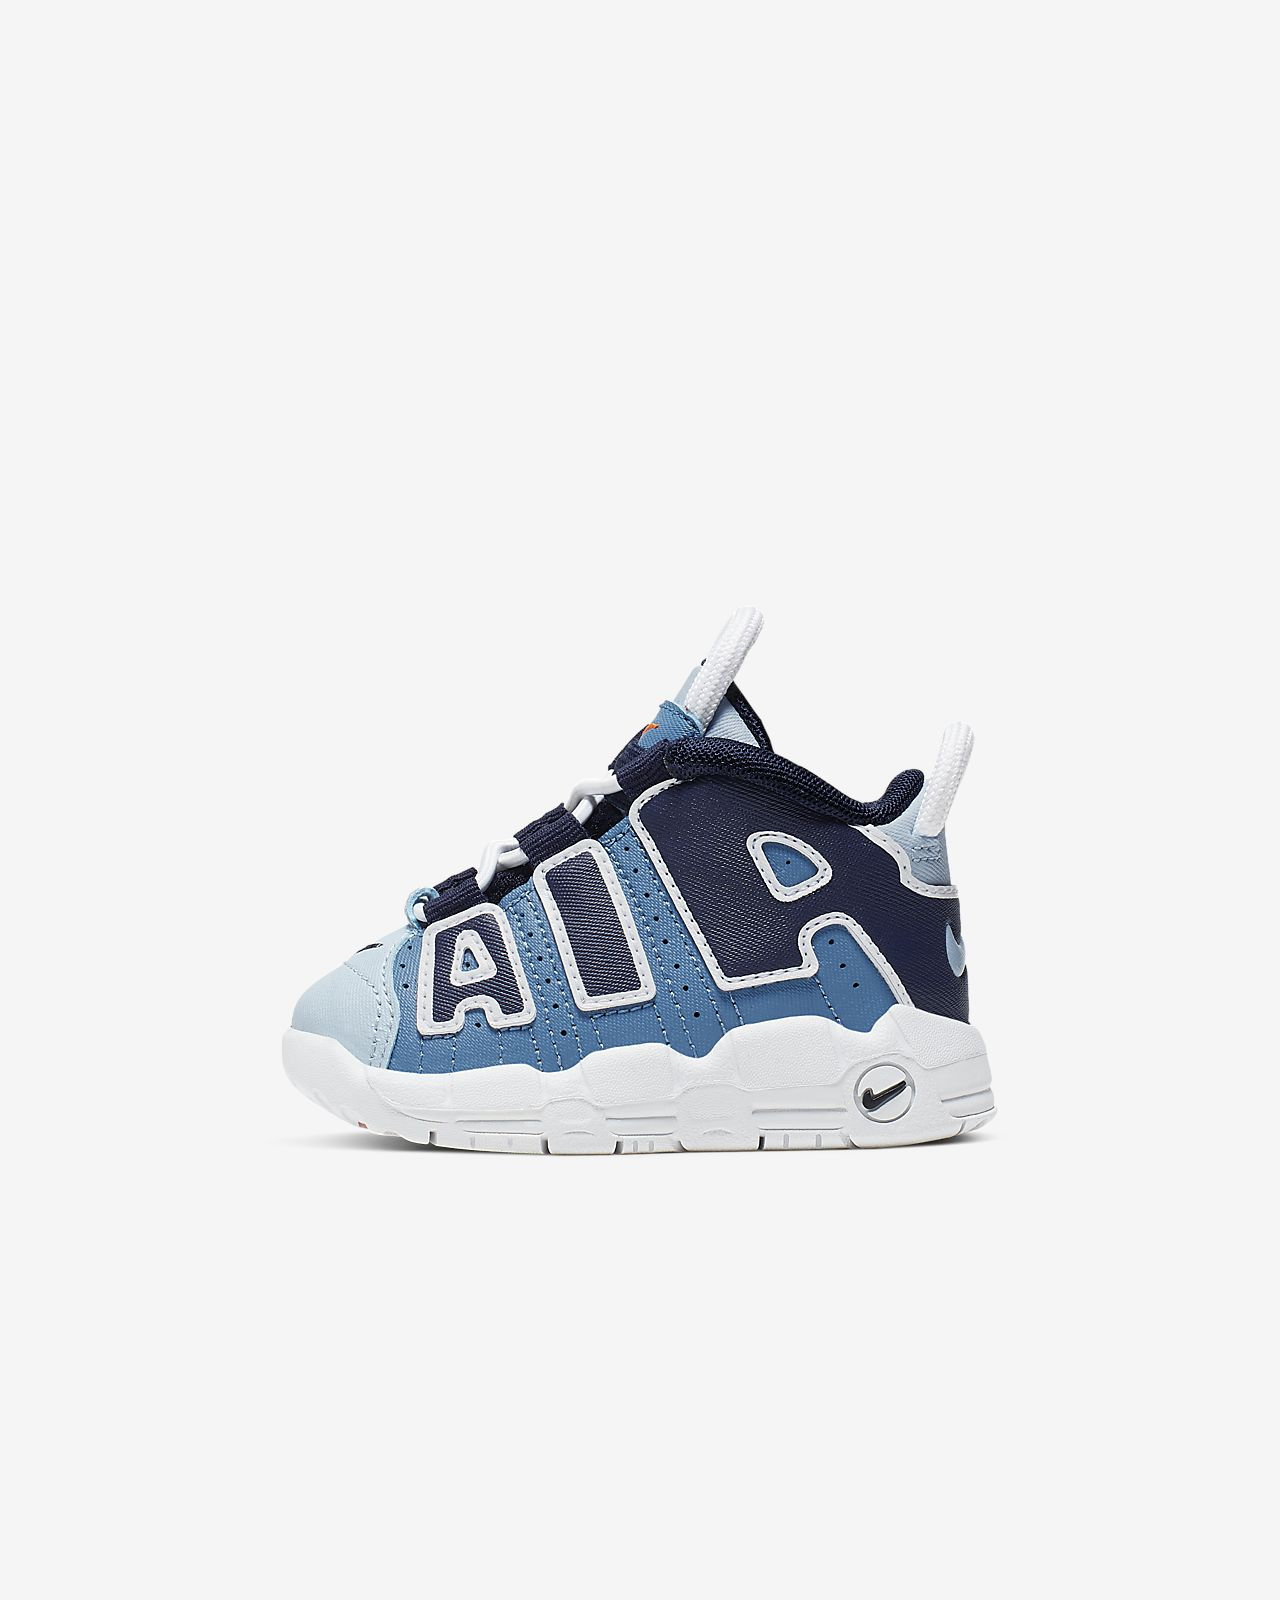 Nike Air More Uptempo BabyToddler Shoe